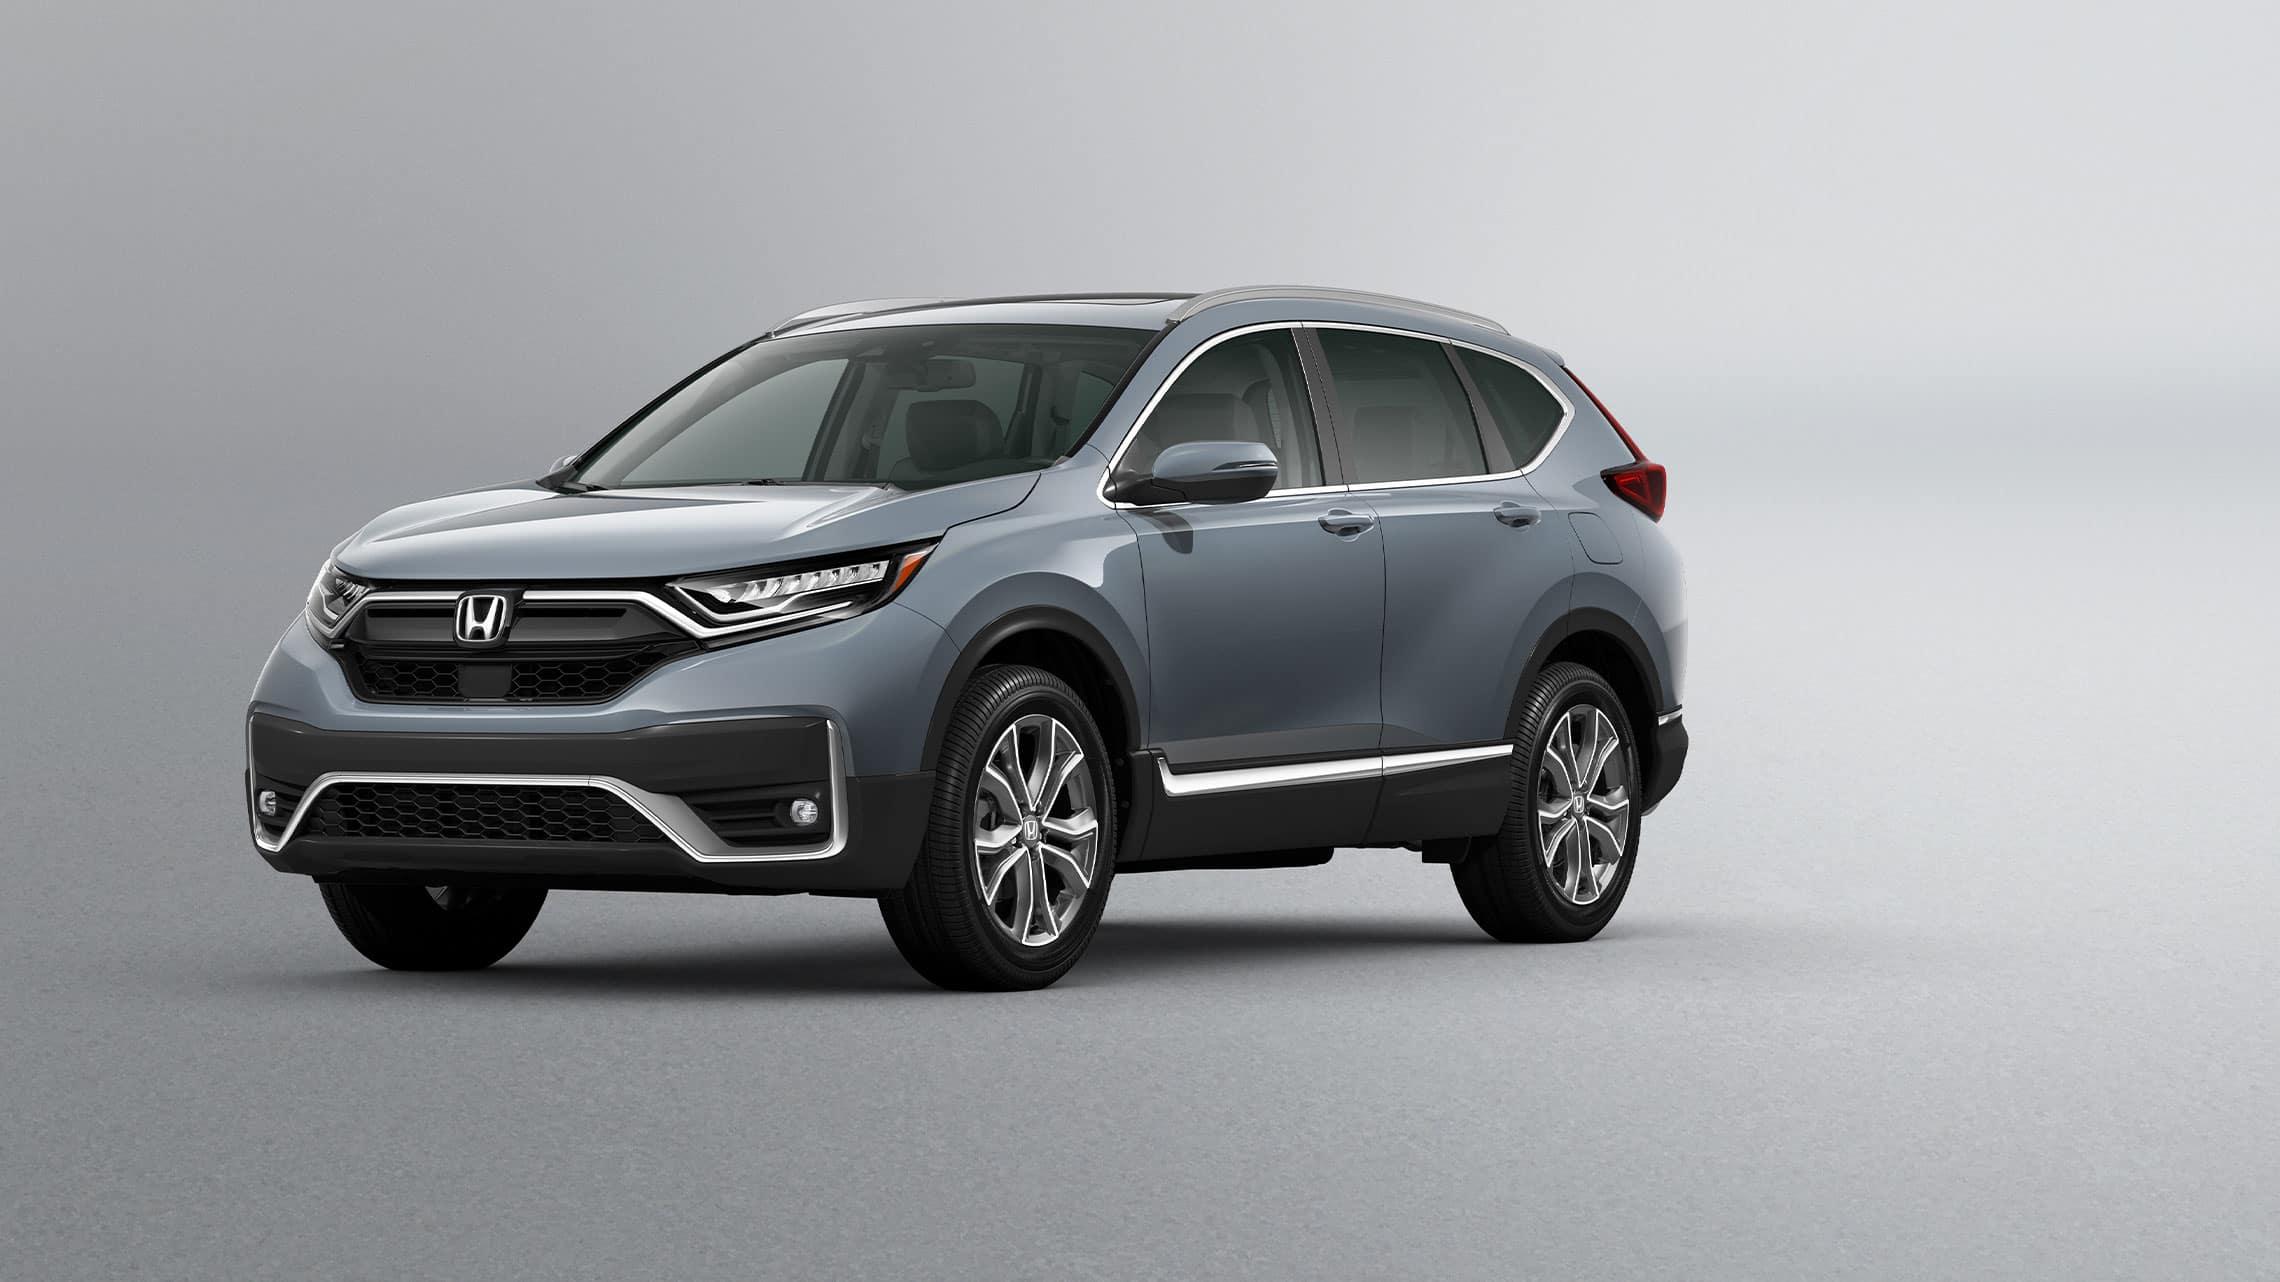 2021 honda cr-v - the midsize turbocharged or hybrid suv